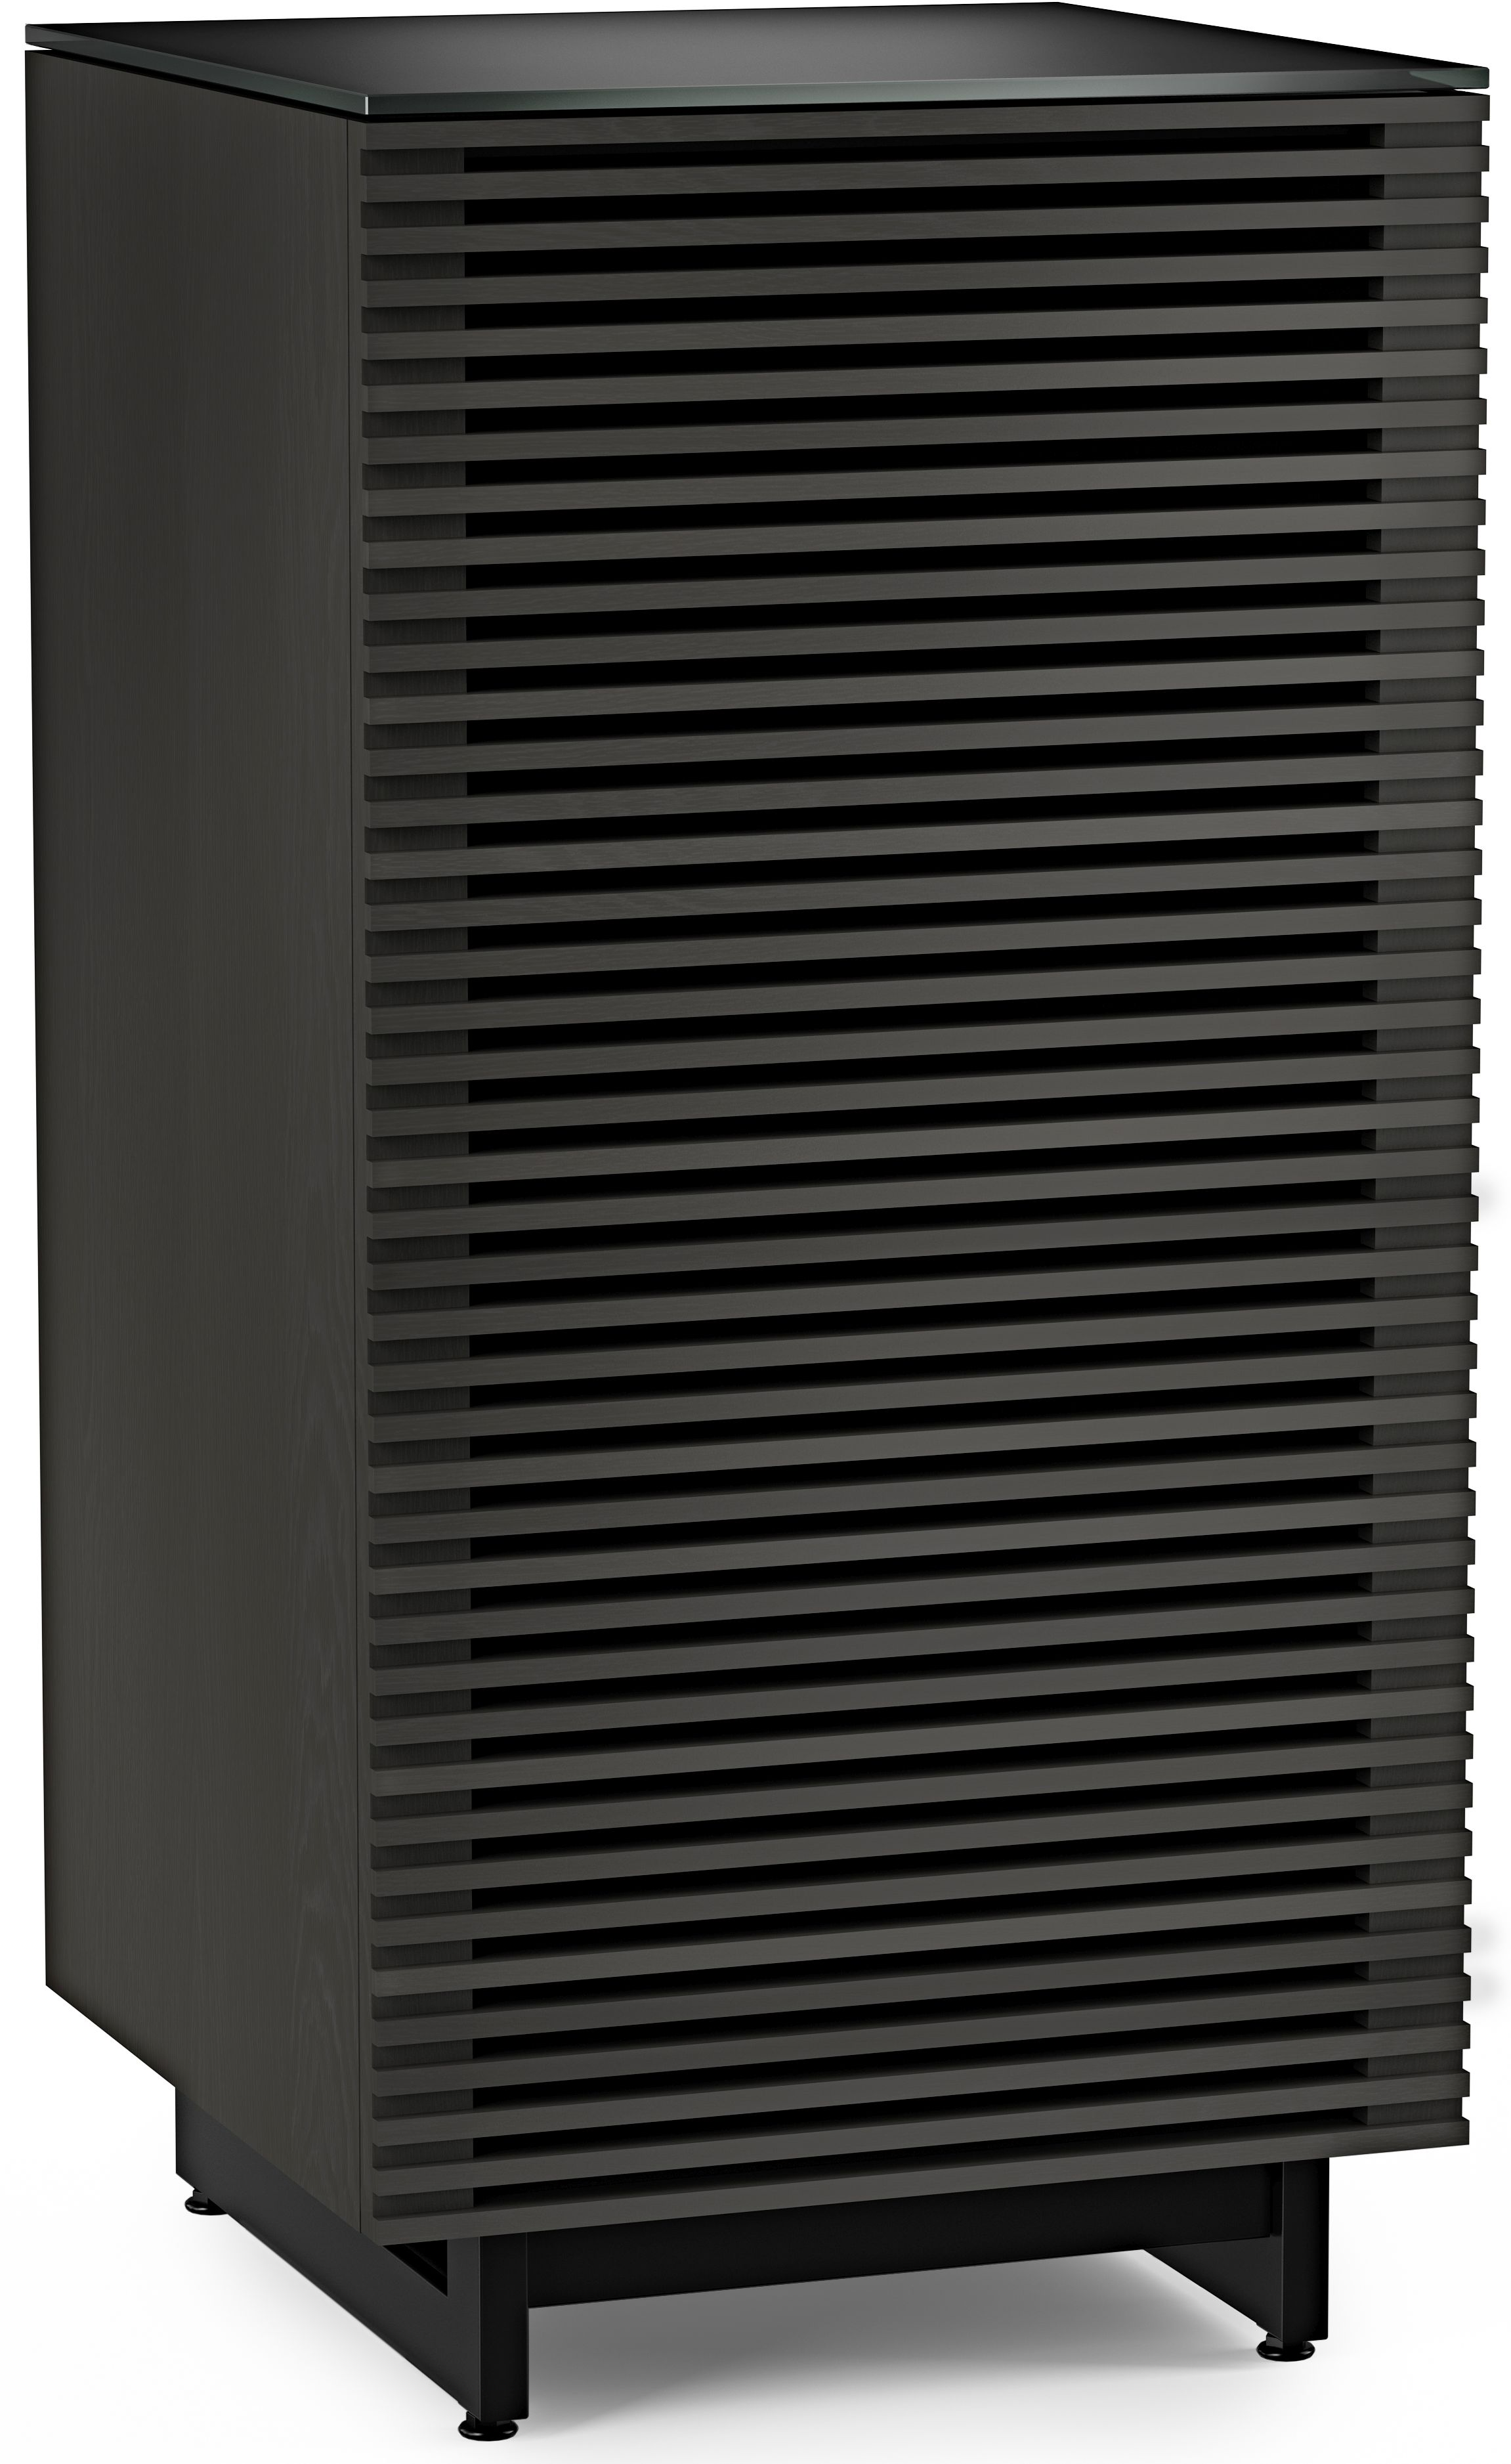 cgrendering cupboard com visualization bdi furniture render b cg studio project